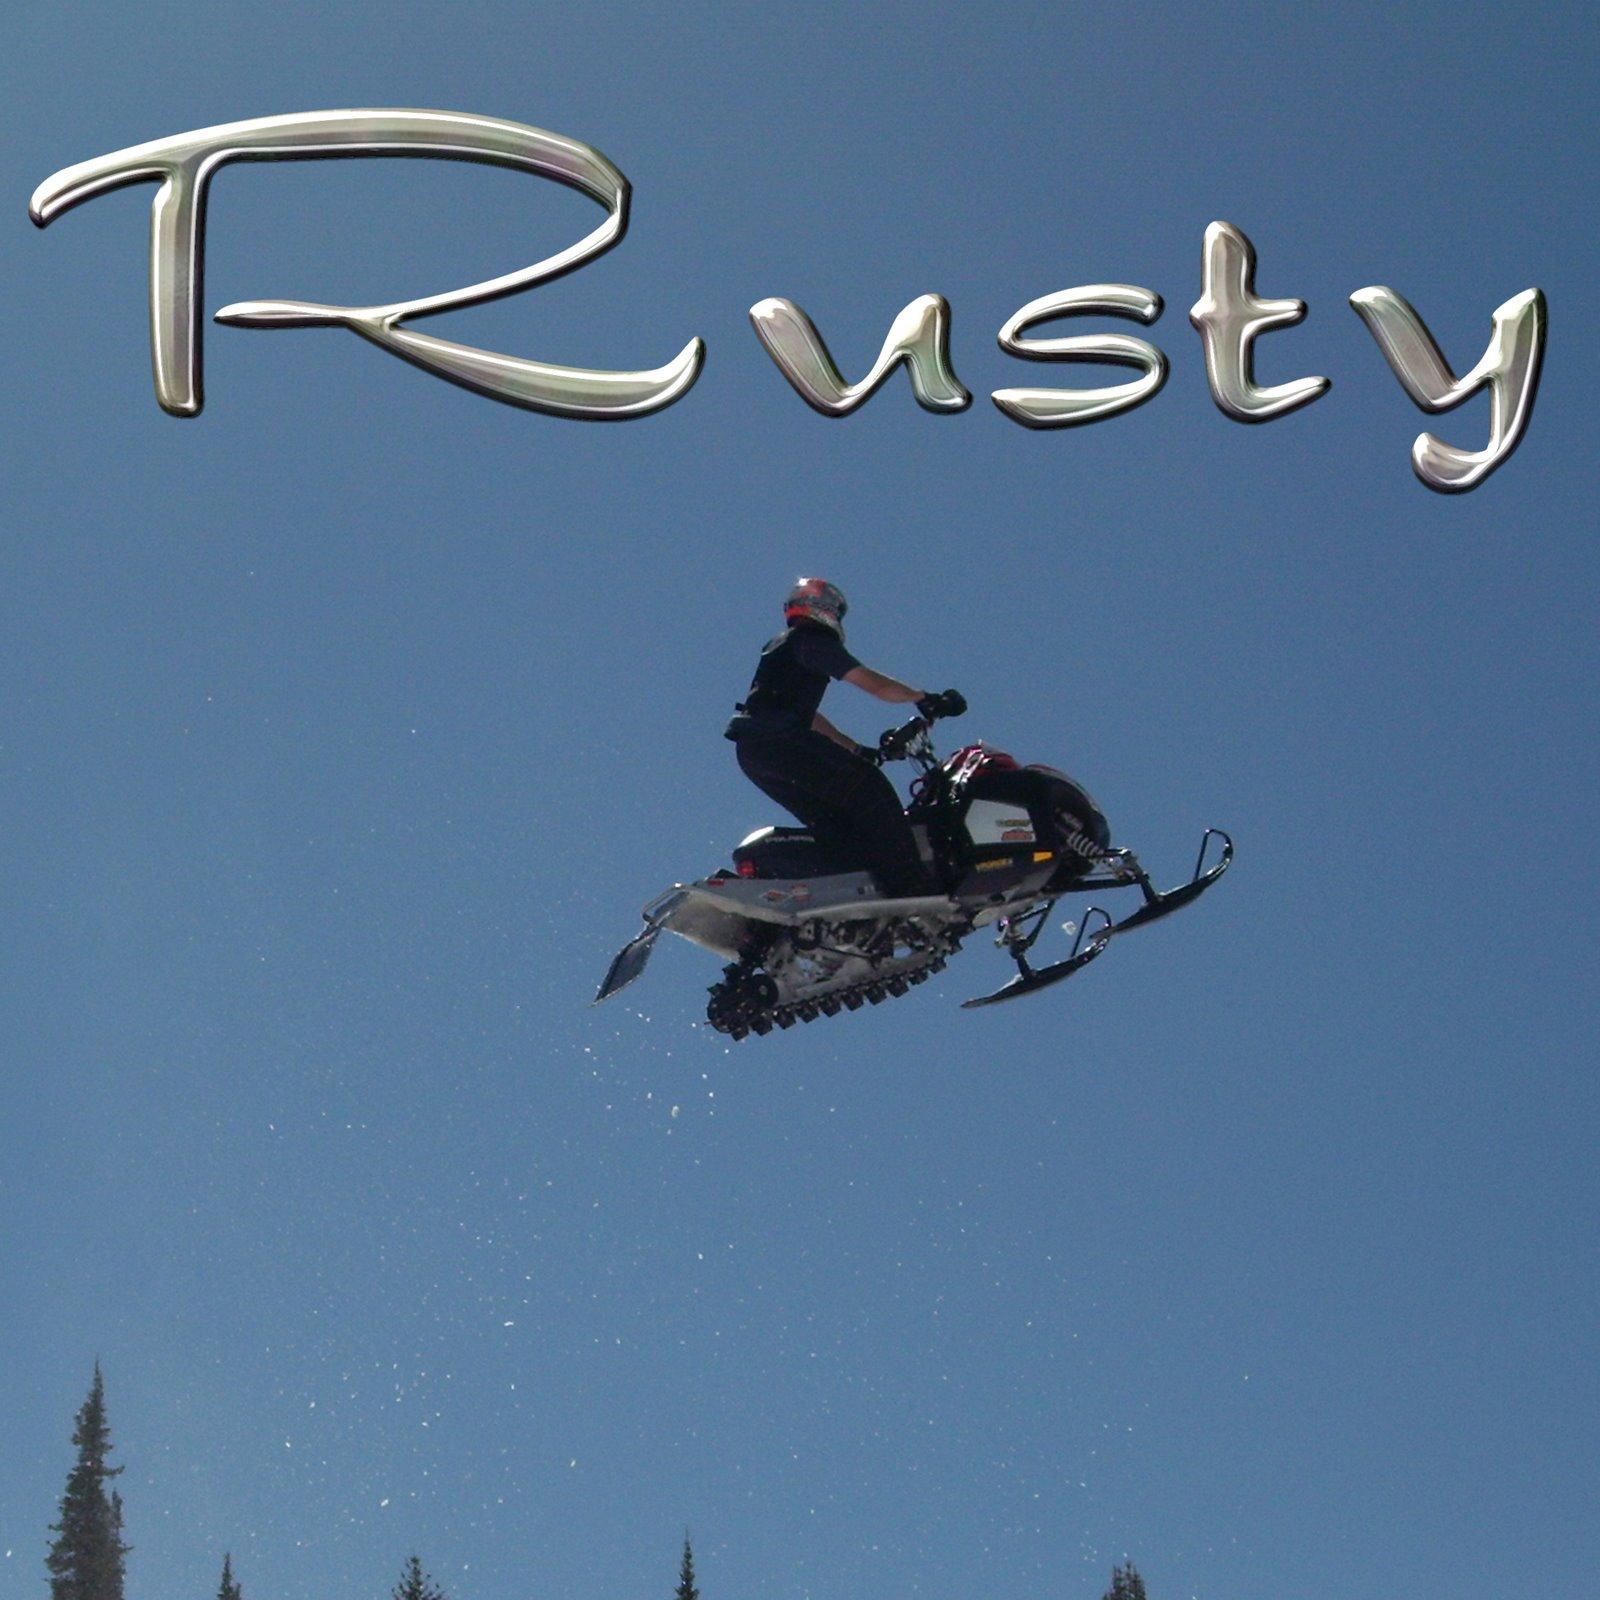 Rusty's Crap